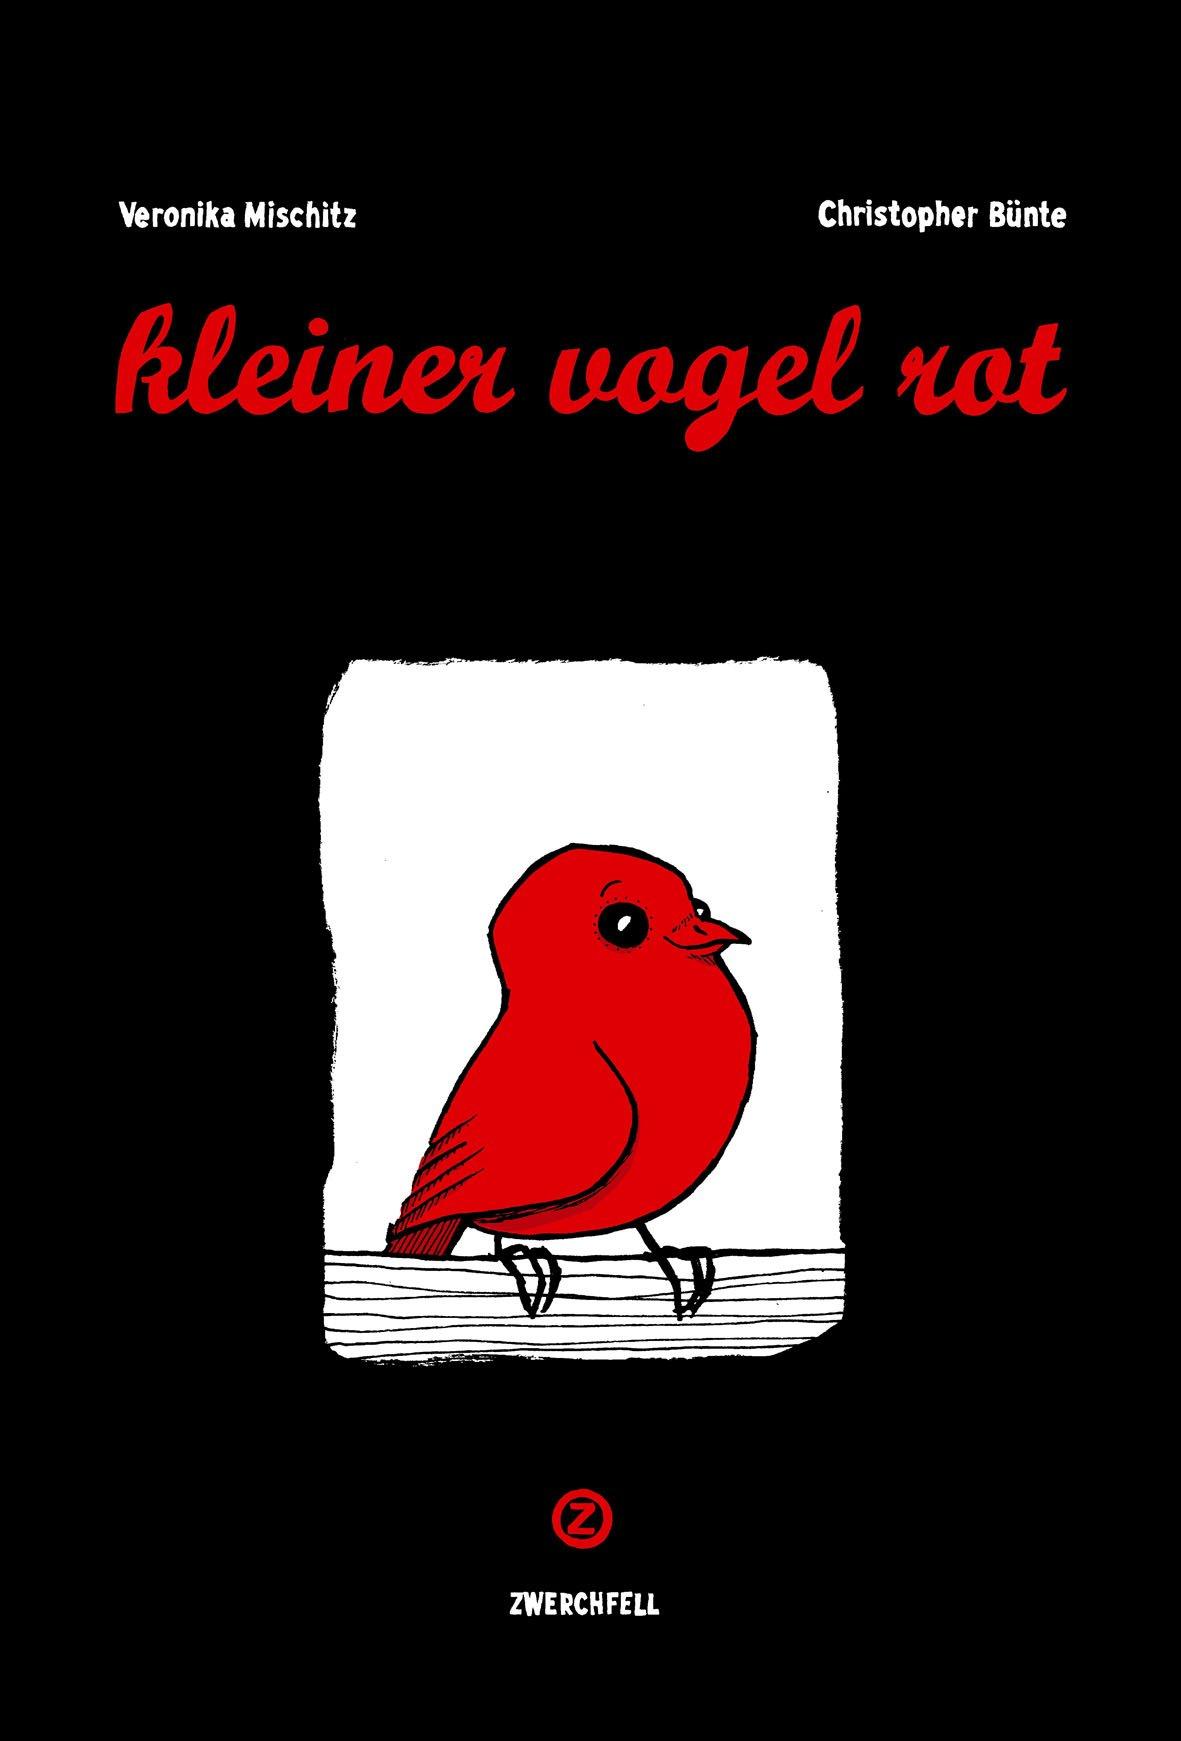 kleiner vogel rot